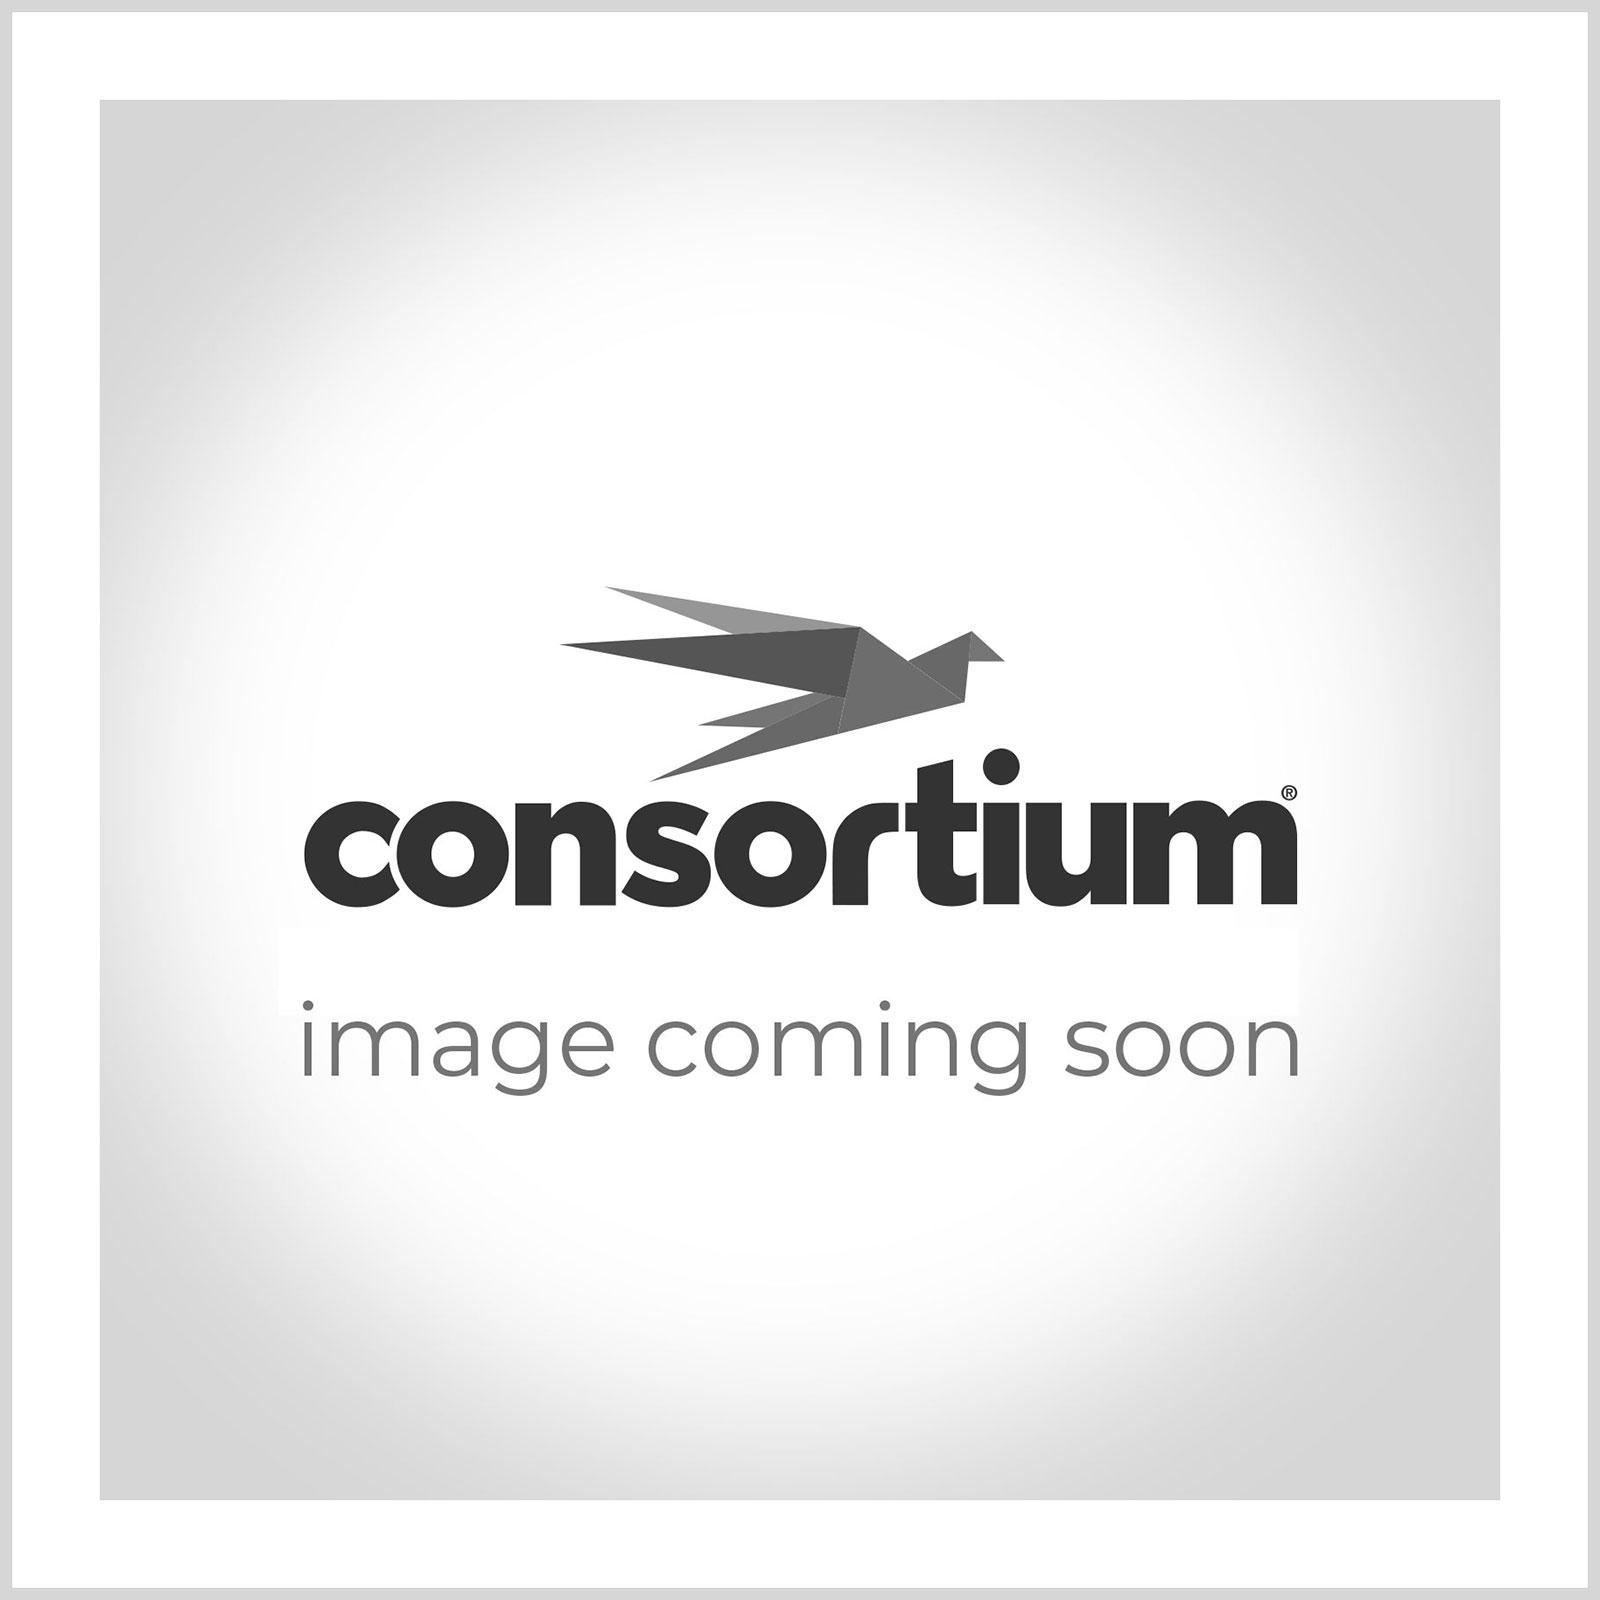 Three Wheel Scooter